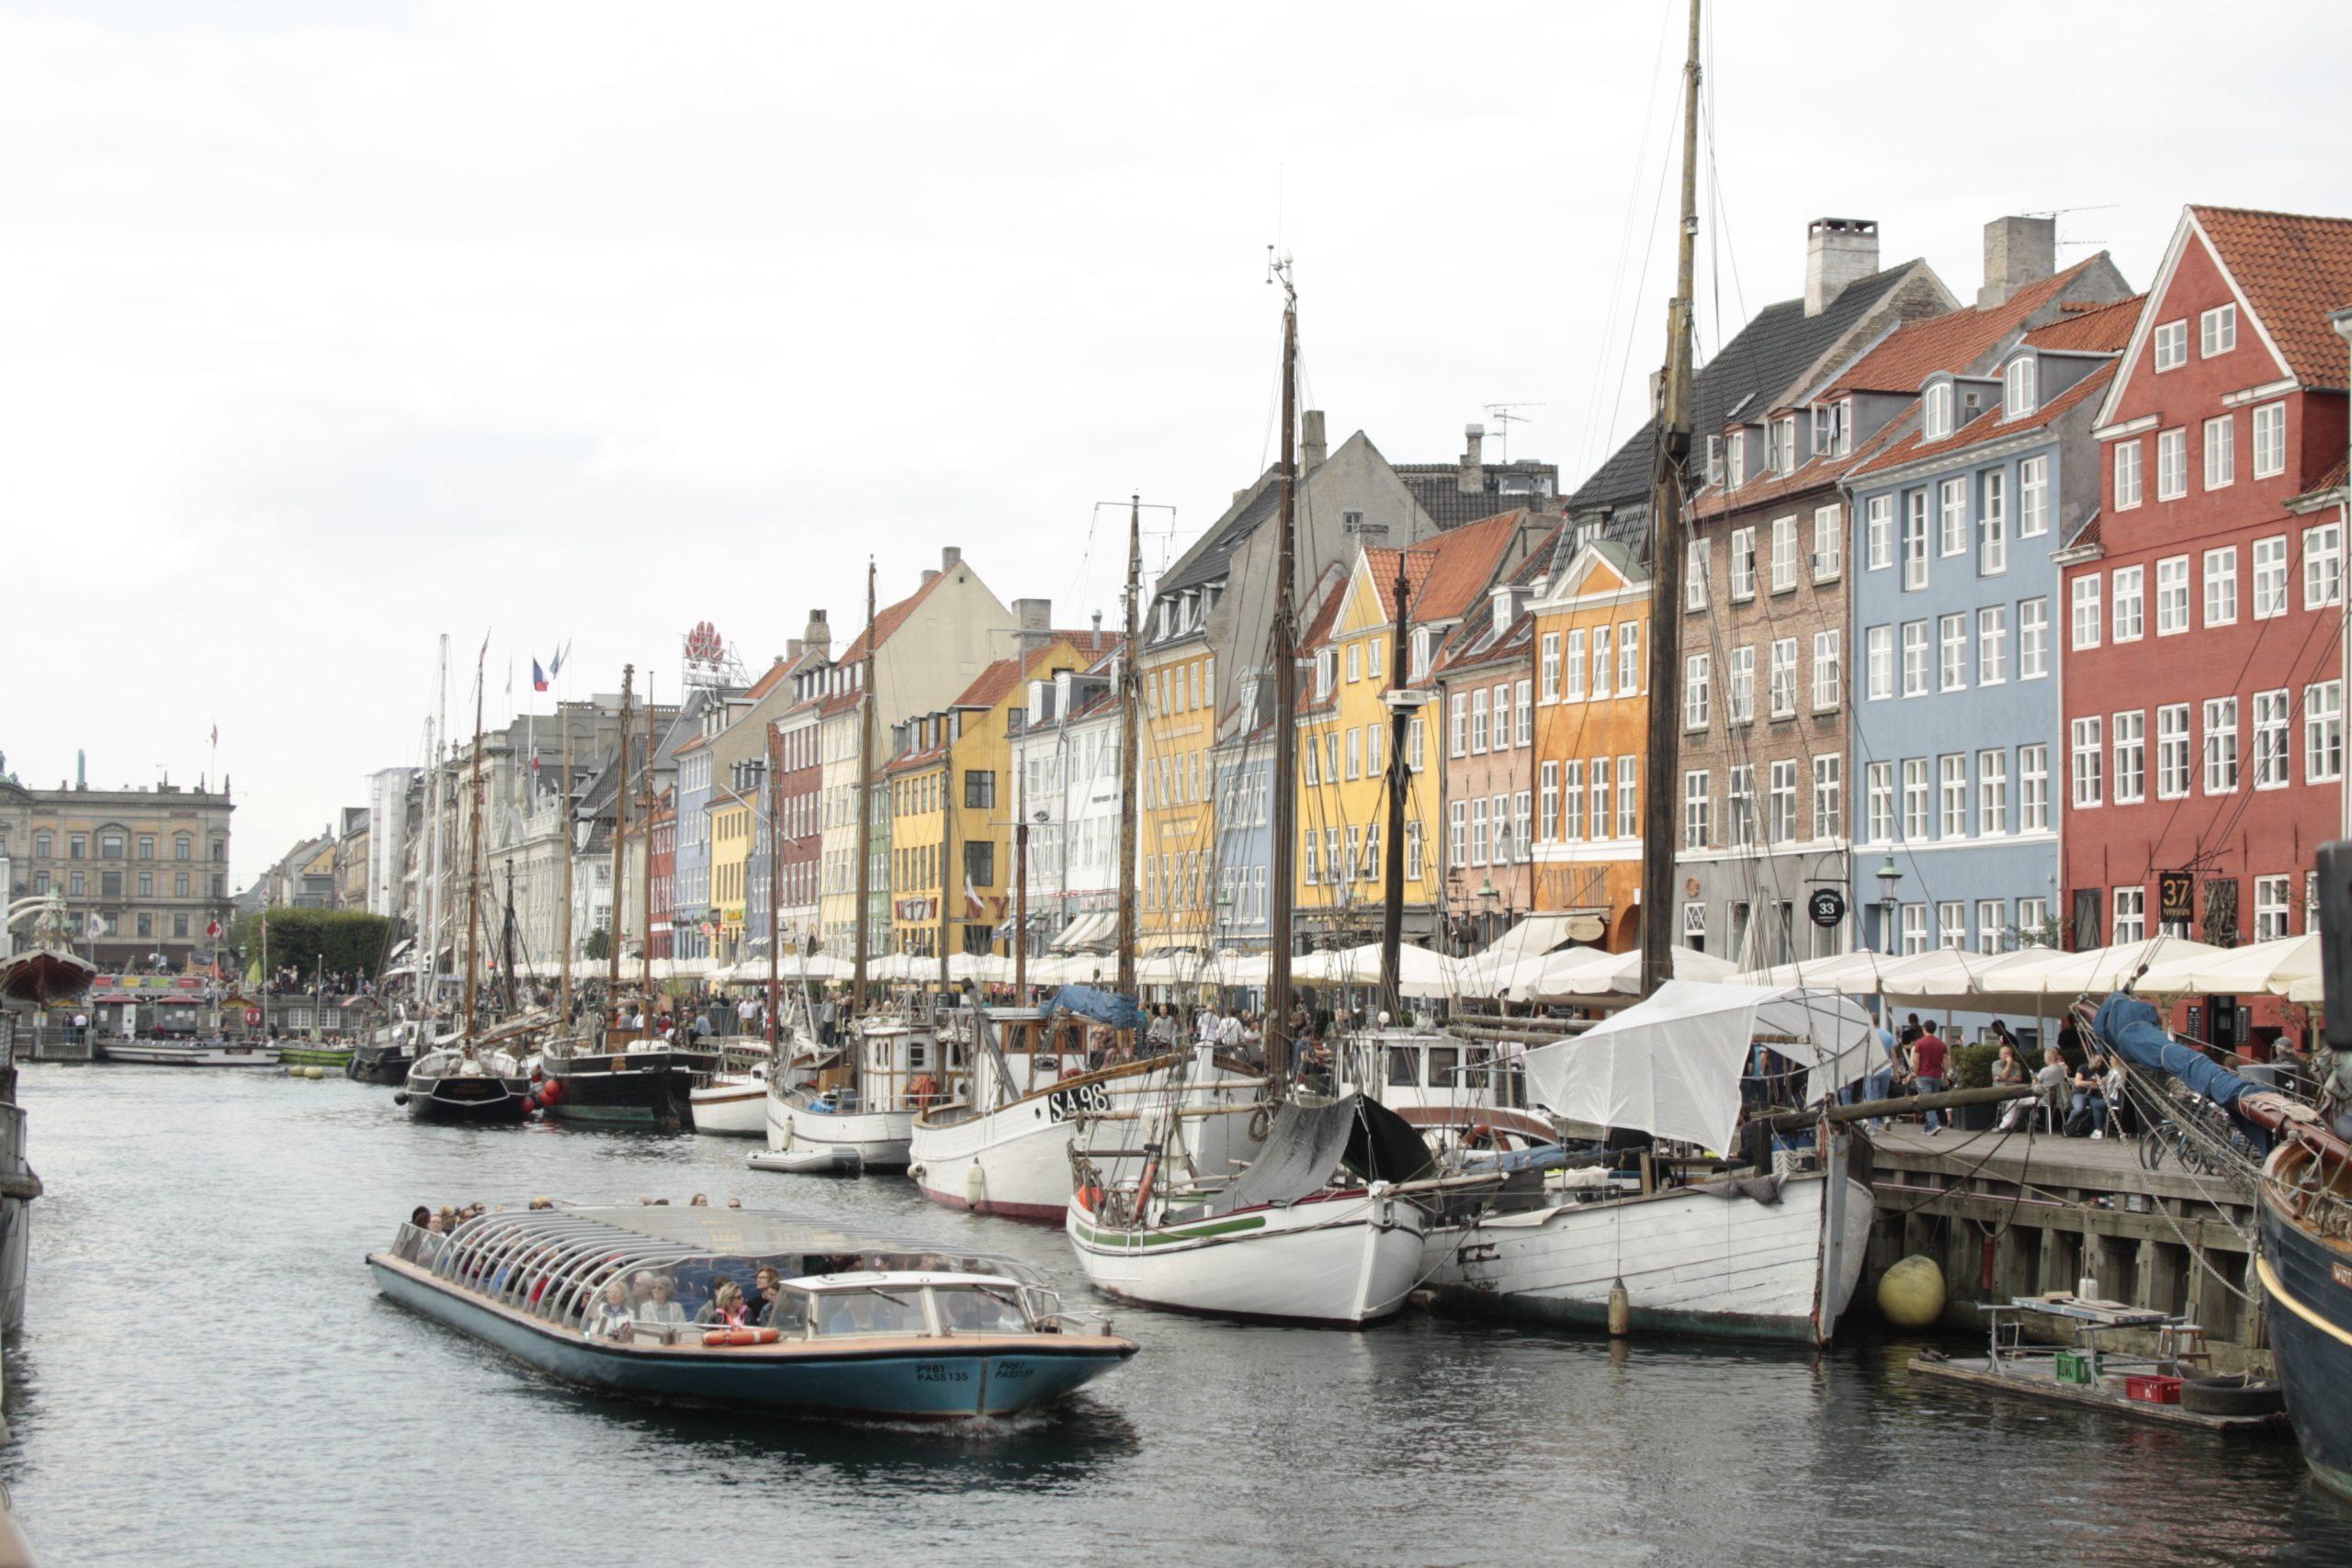 Dinamarca, Pequena Sereia, Copenhegen, Escandinávia, Nyhavn